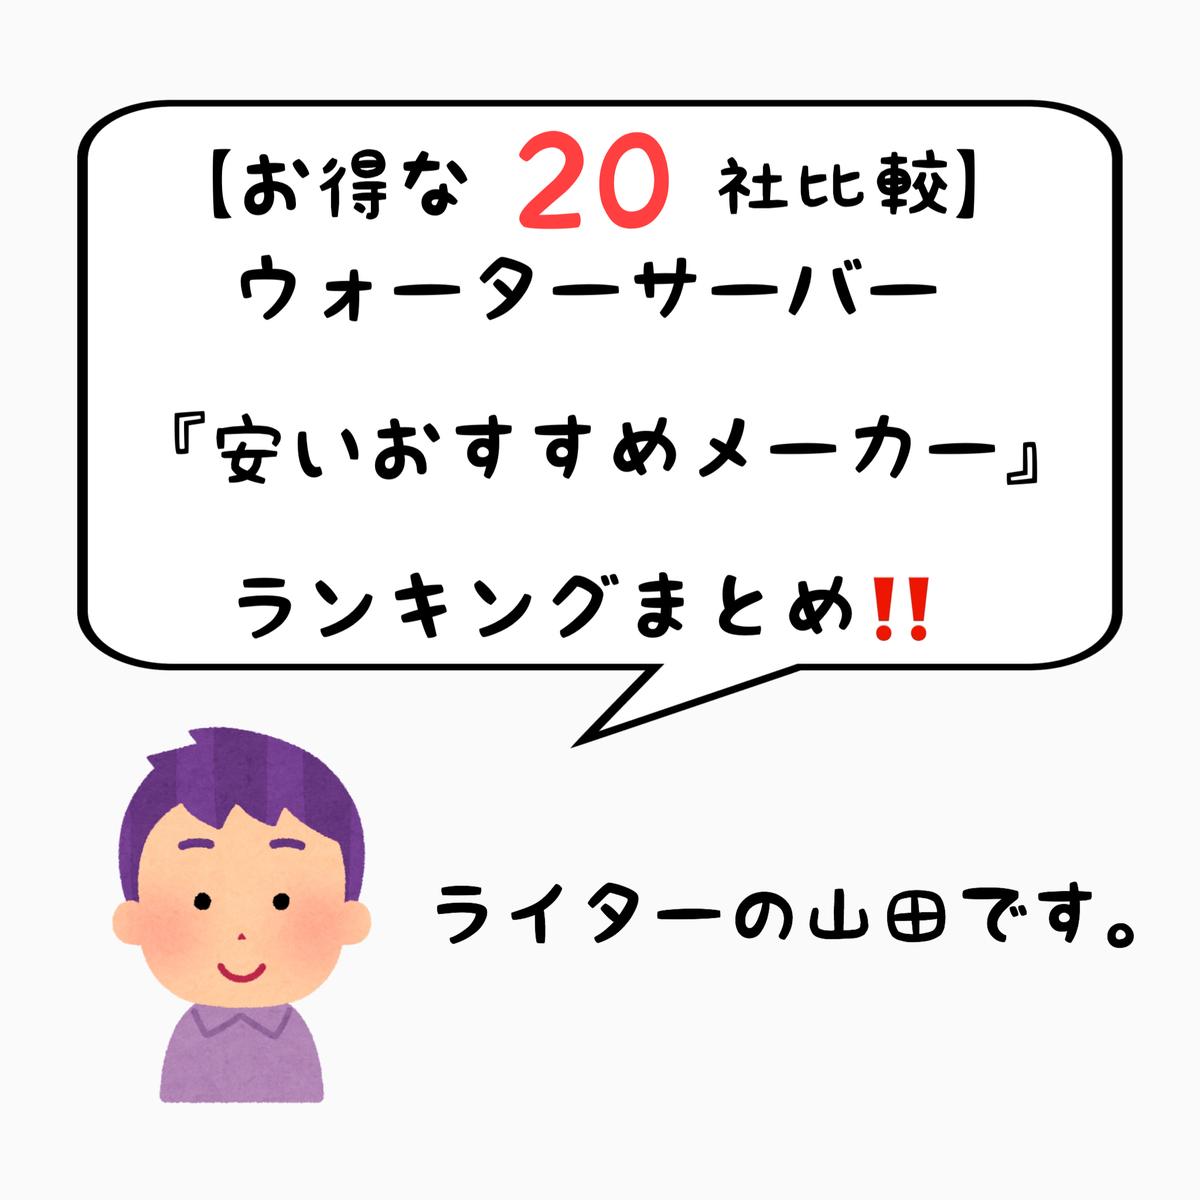 f:id:nokonoko_o:20201209162617j:plain